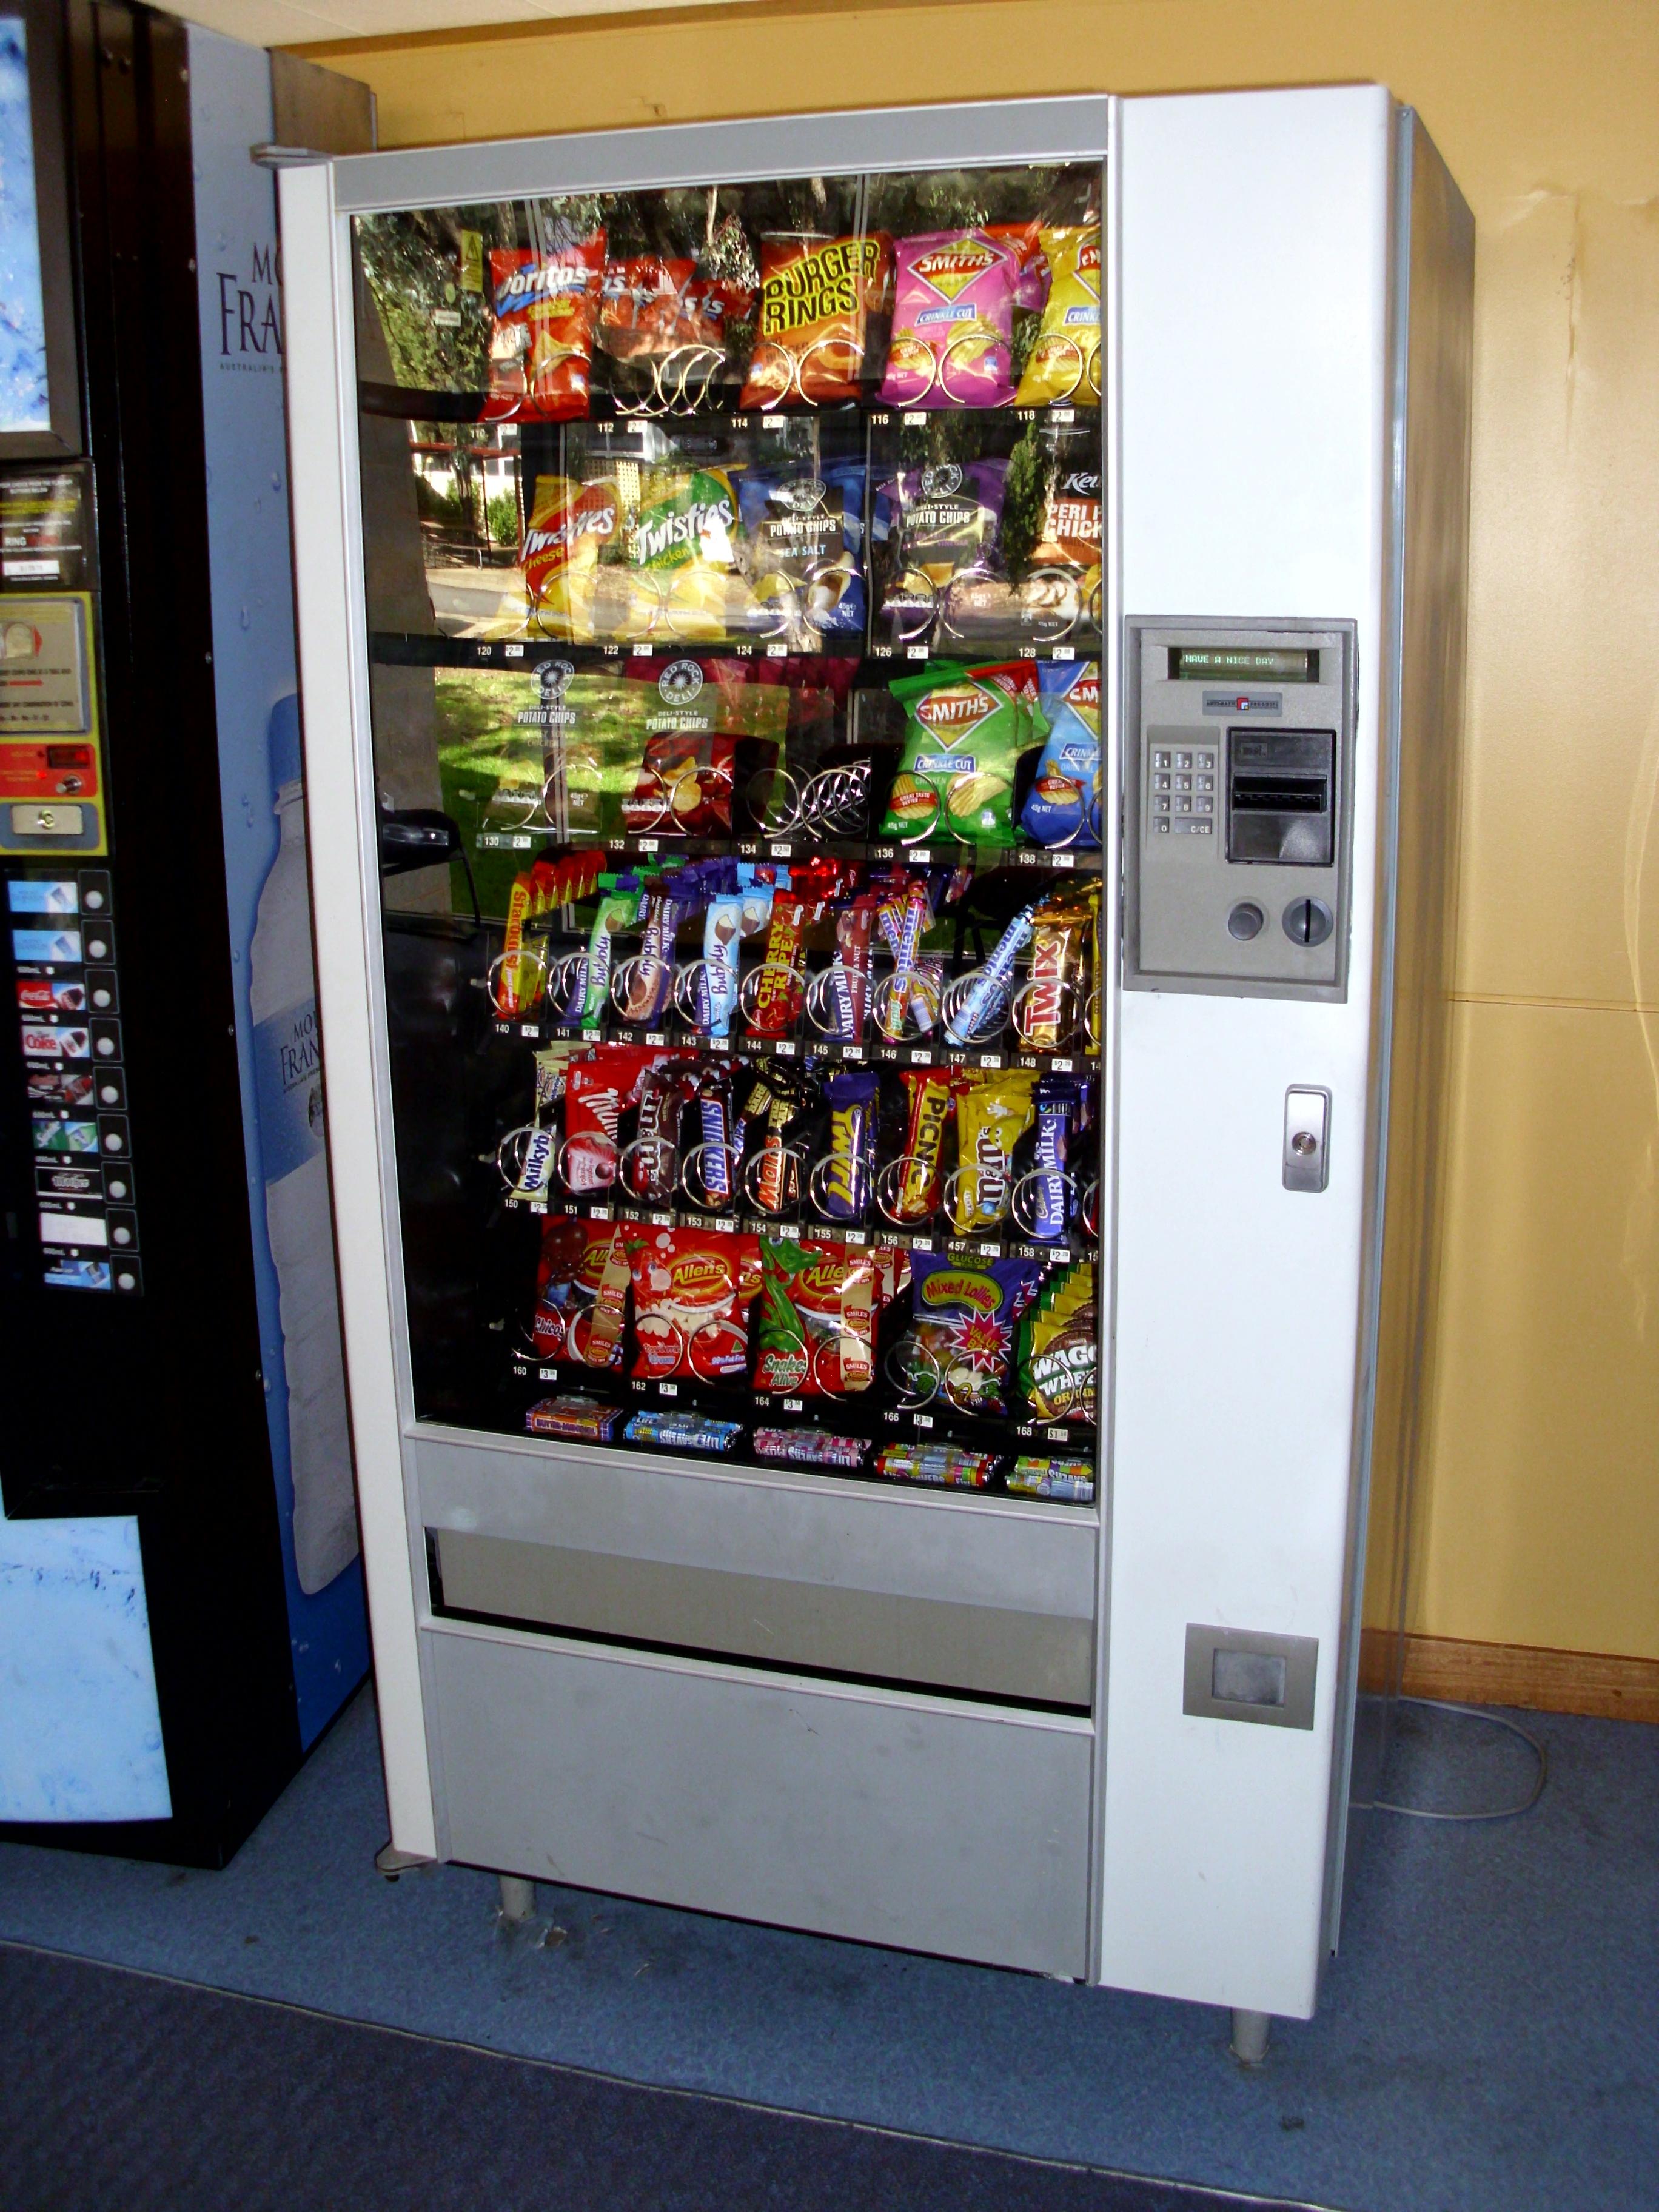 free snacks from vending machine